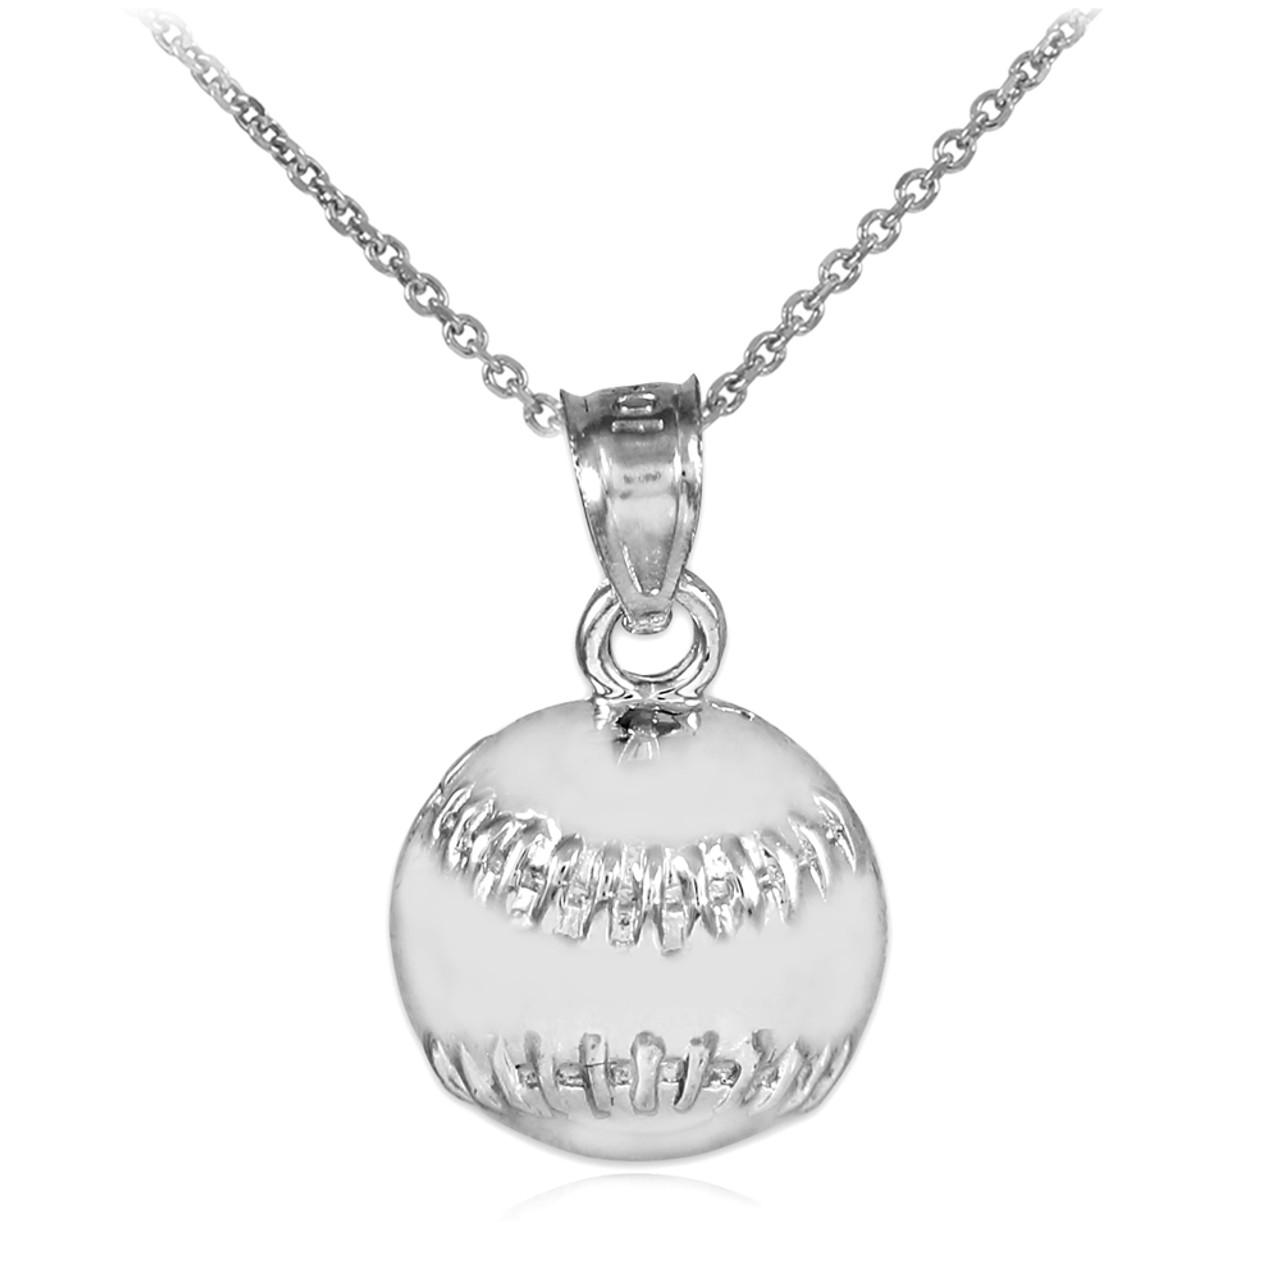 white gold baseball softball charm sports pendant